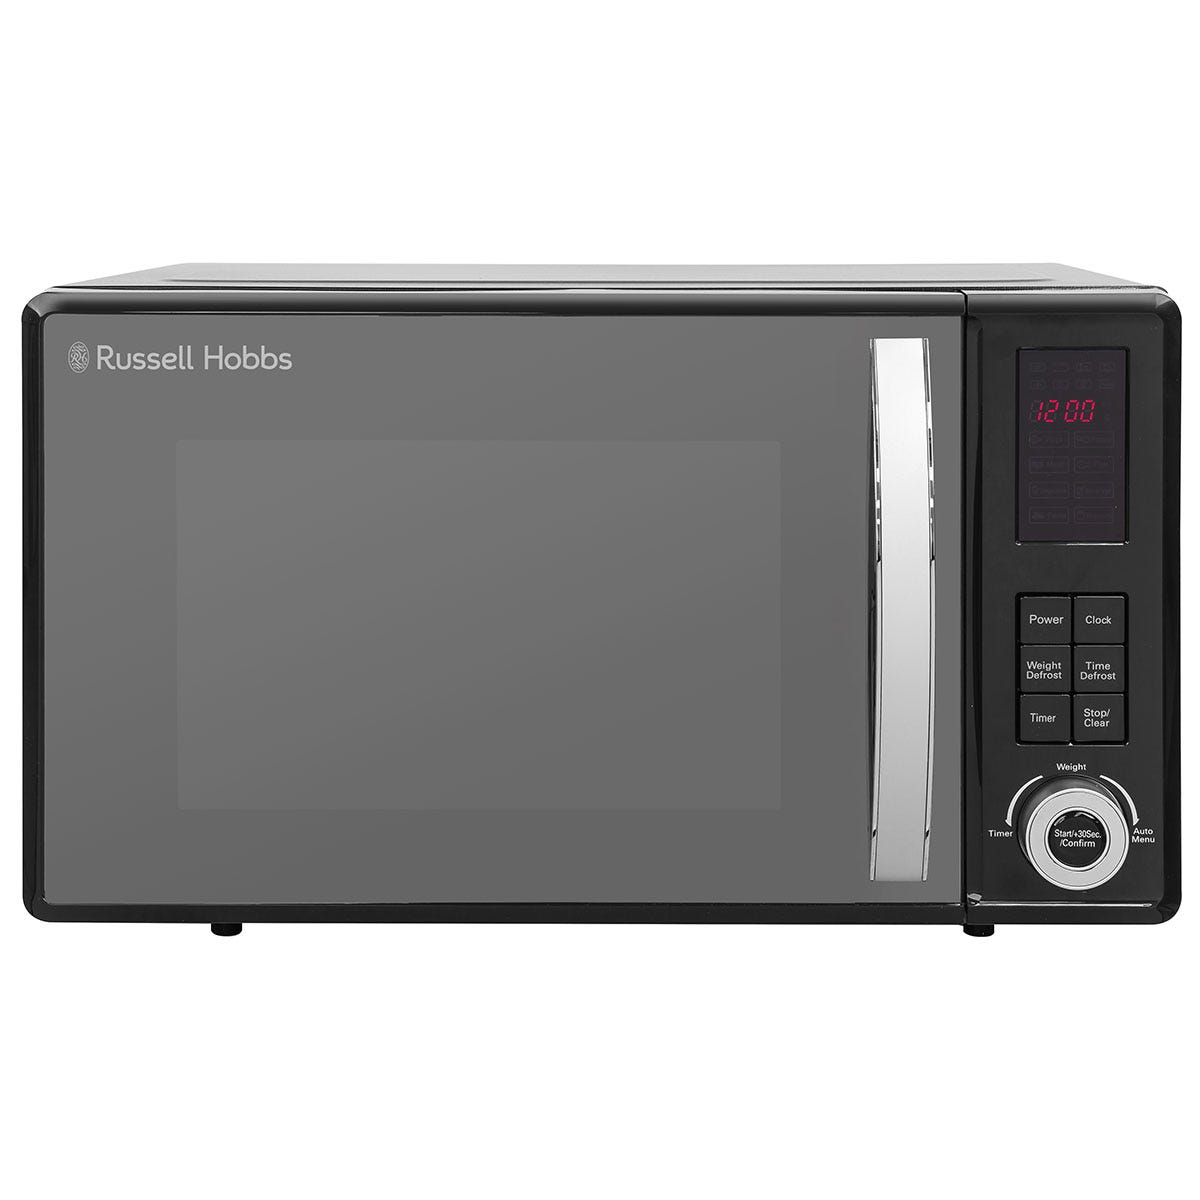 Russell Hobbs RHM2362B-G 800W 23L Digital Microwave - Black